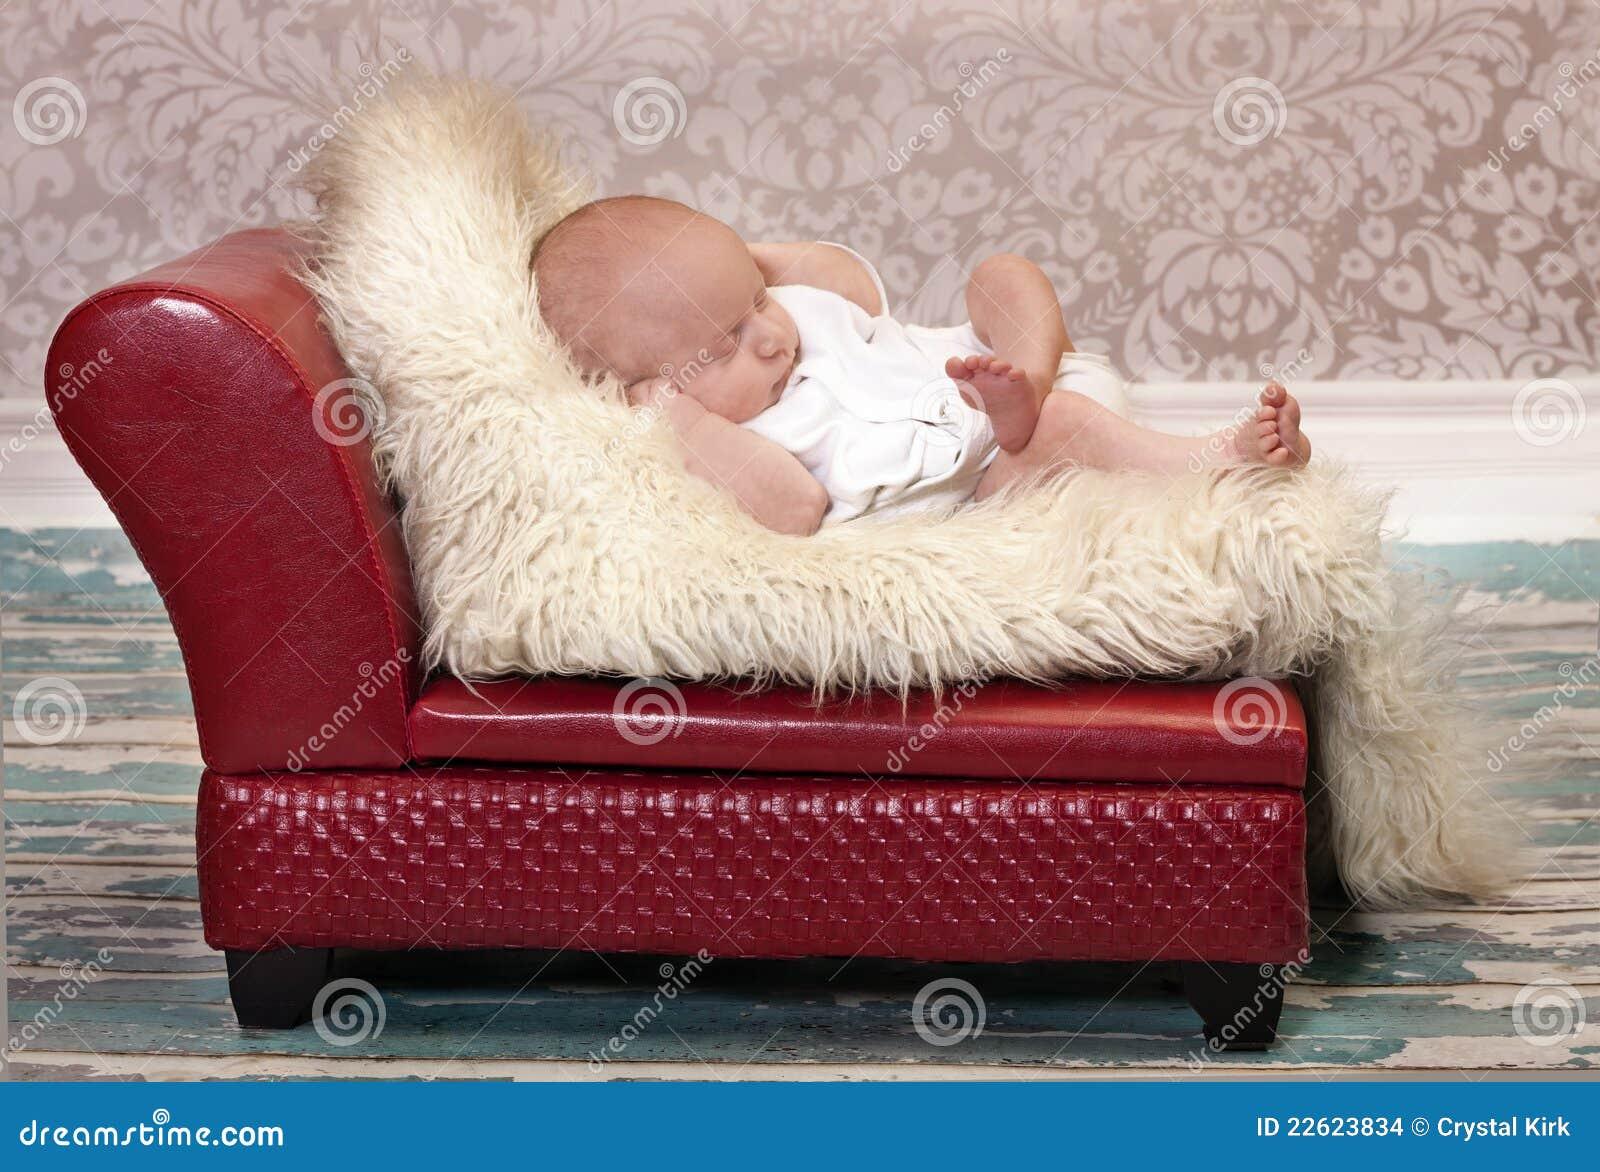 Newborn Photography Props Baby Posing Sofa Studio Photo